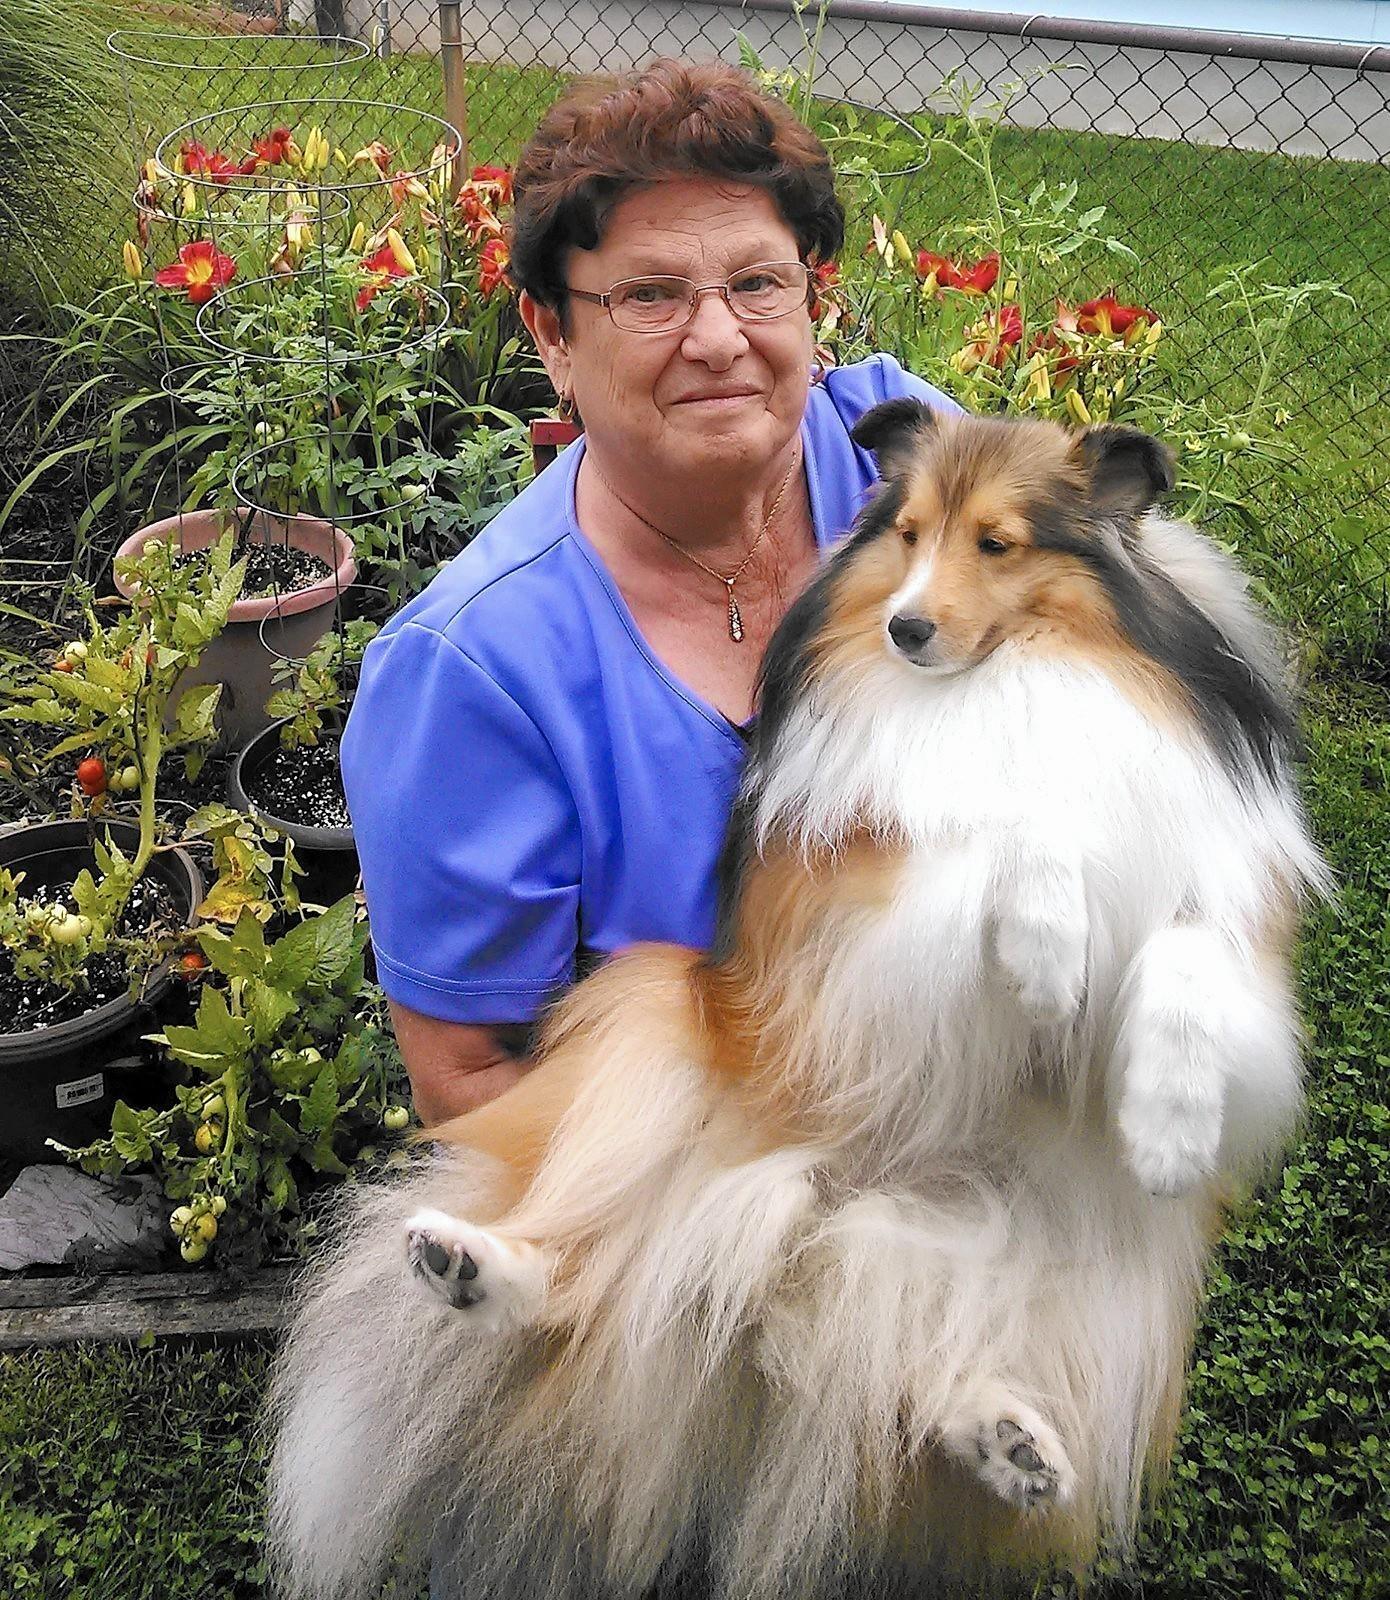 Glen burnie east local woman s passion serves animals community